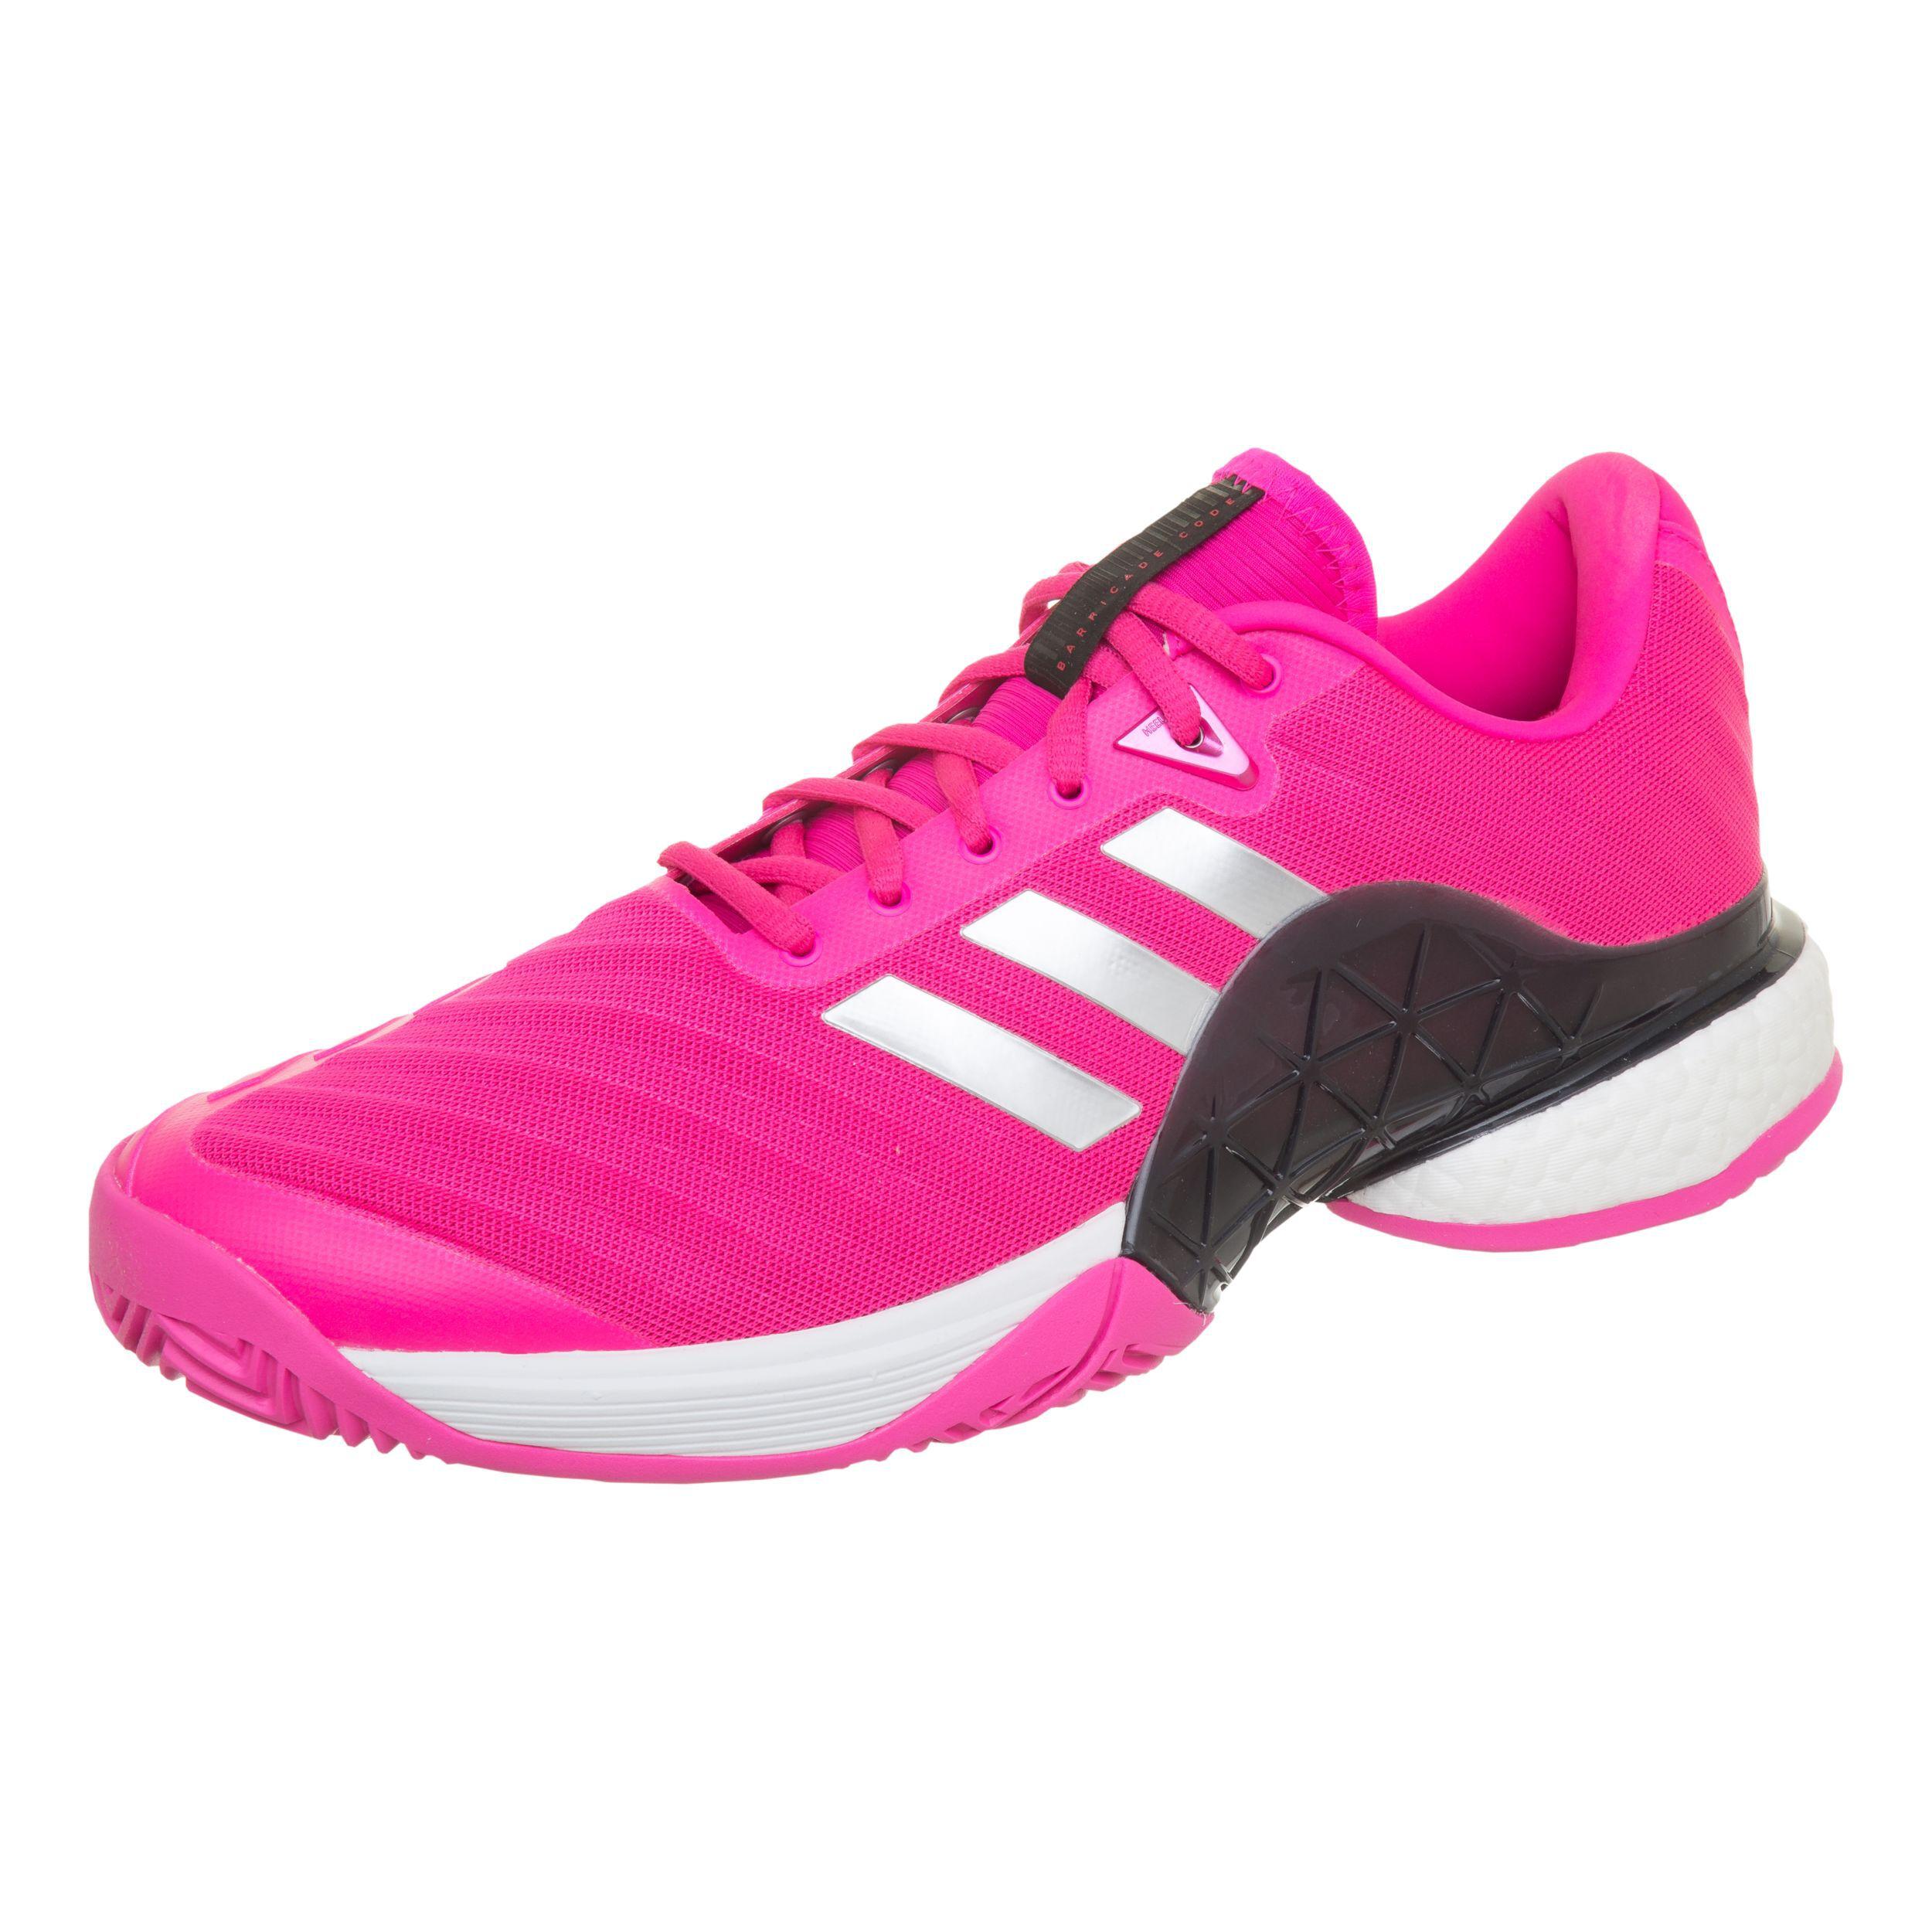 adidas Barricade 2018 Boost Allroundsko Herrar Pink, Vit